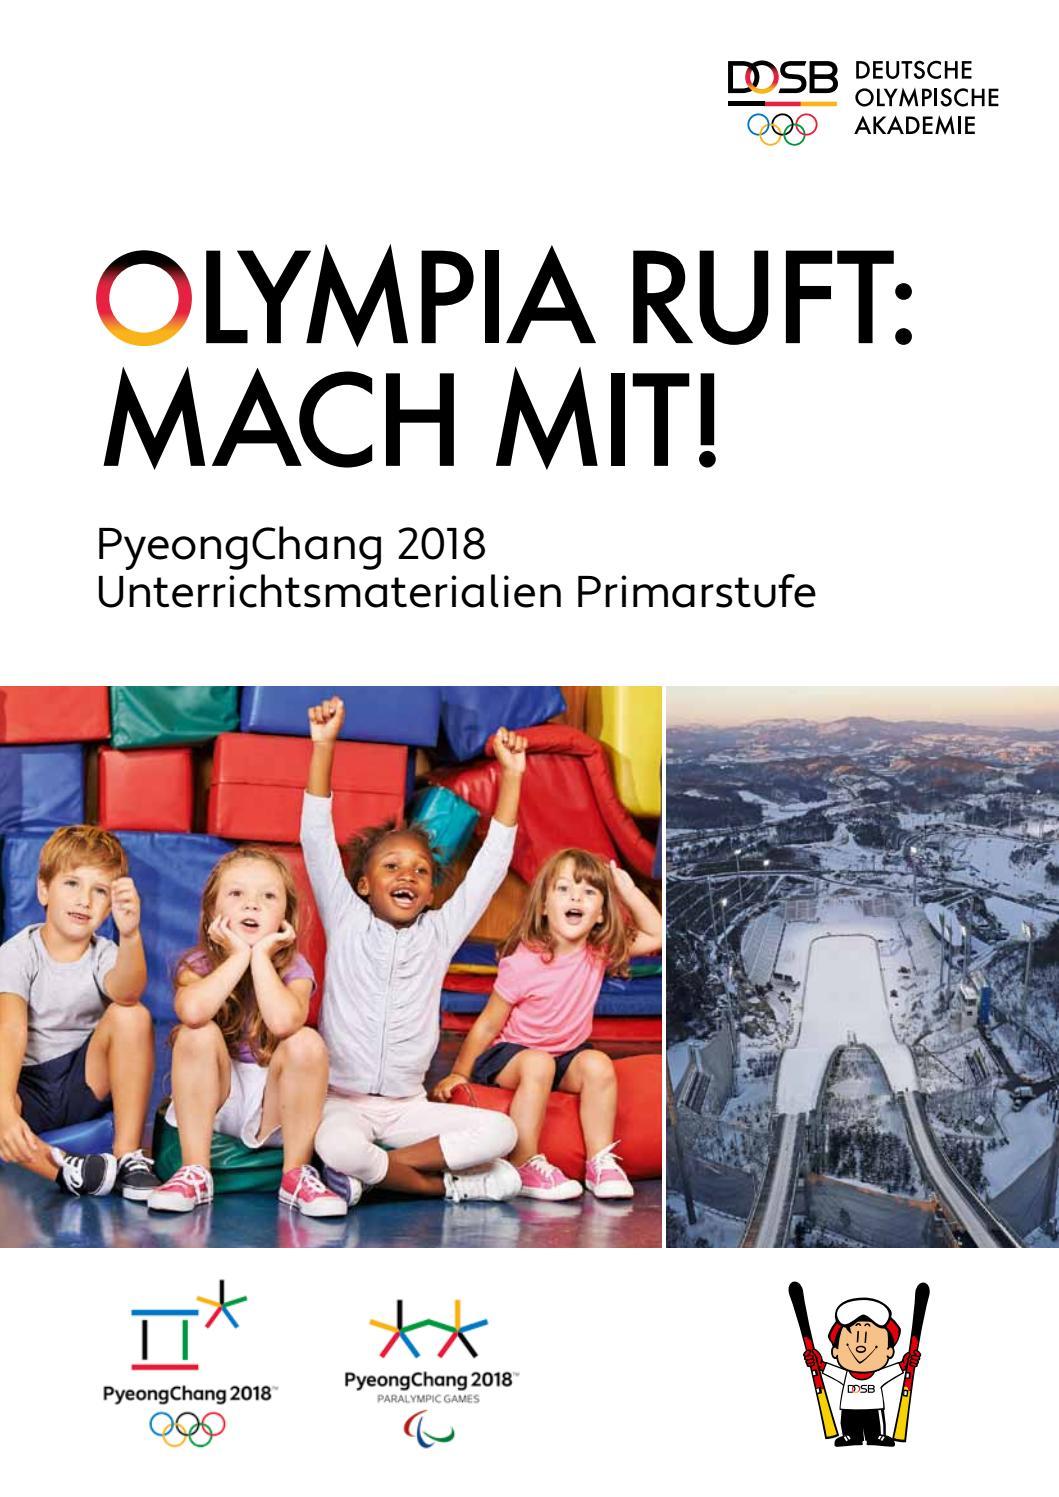 Olympia ruft: Mach mit!\